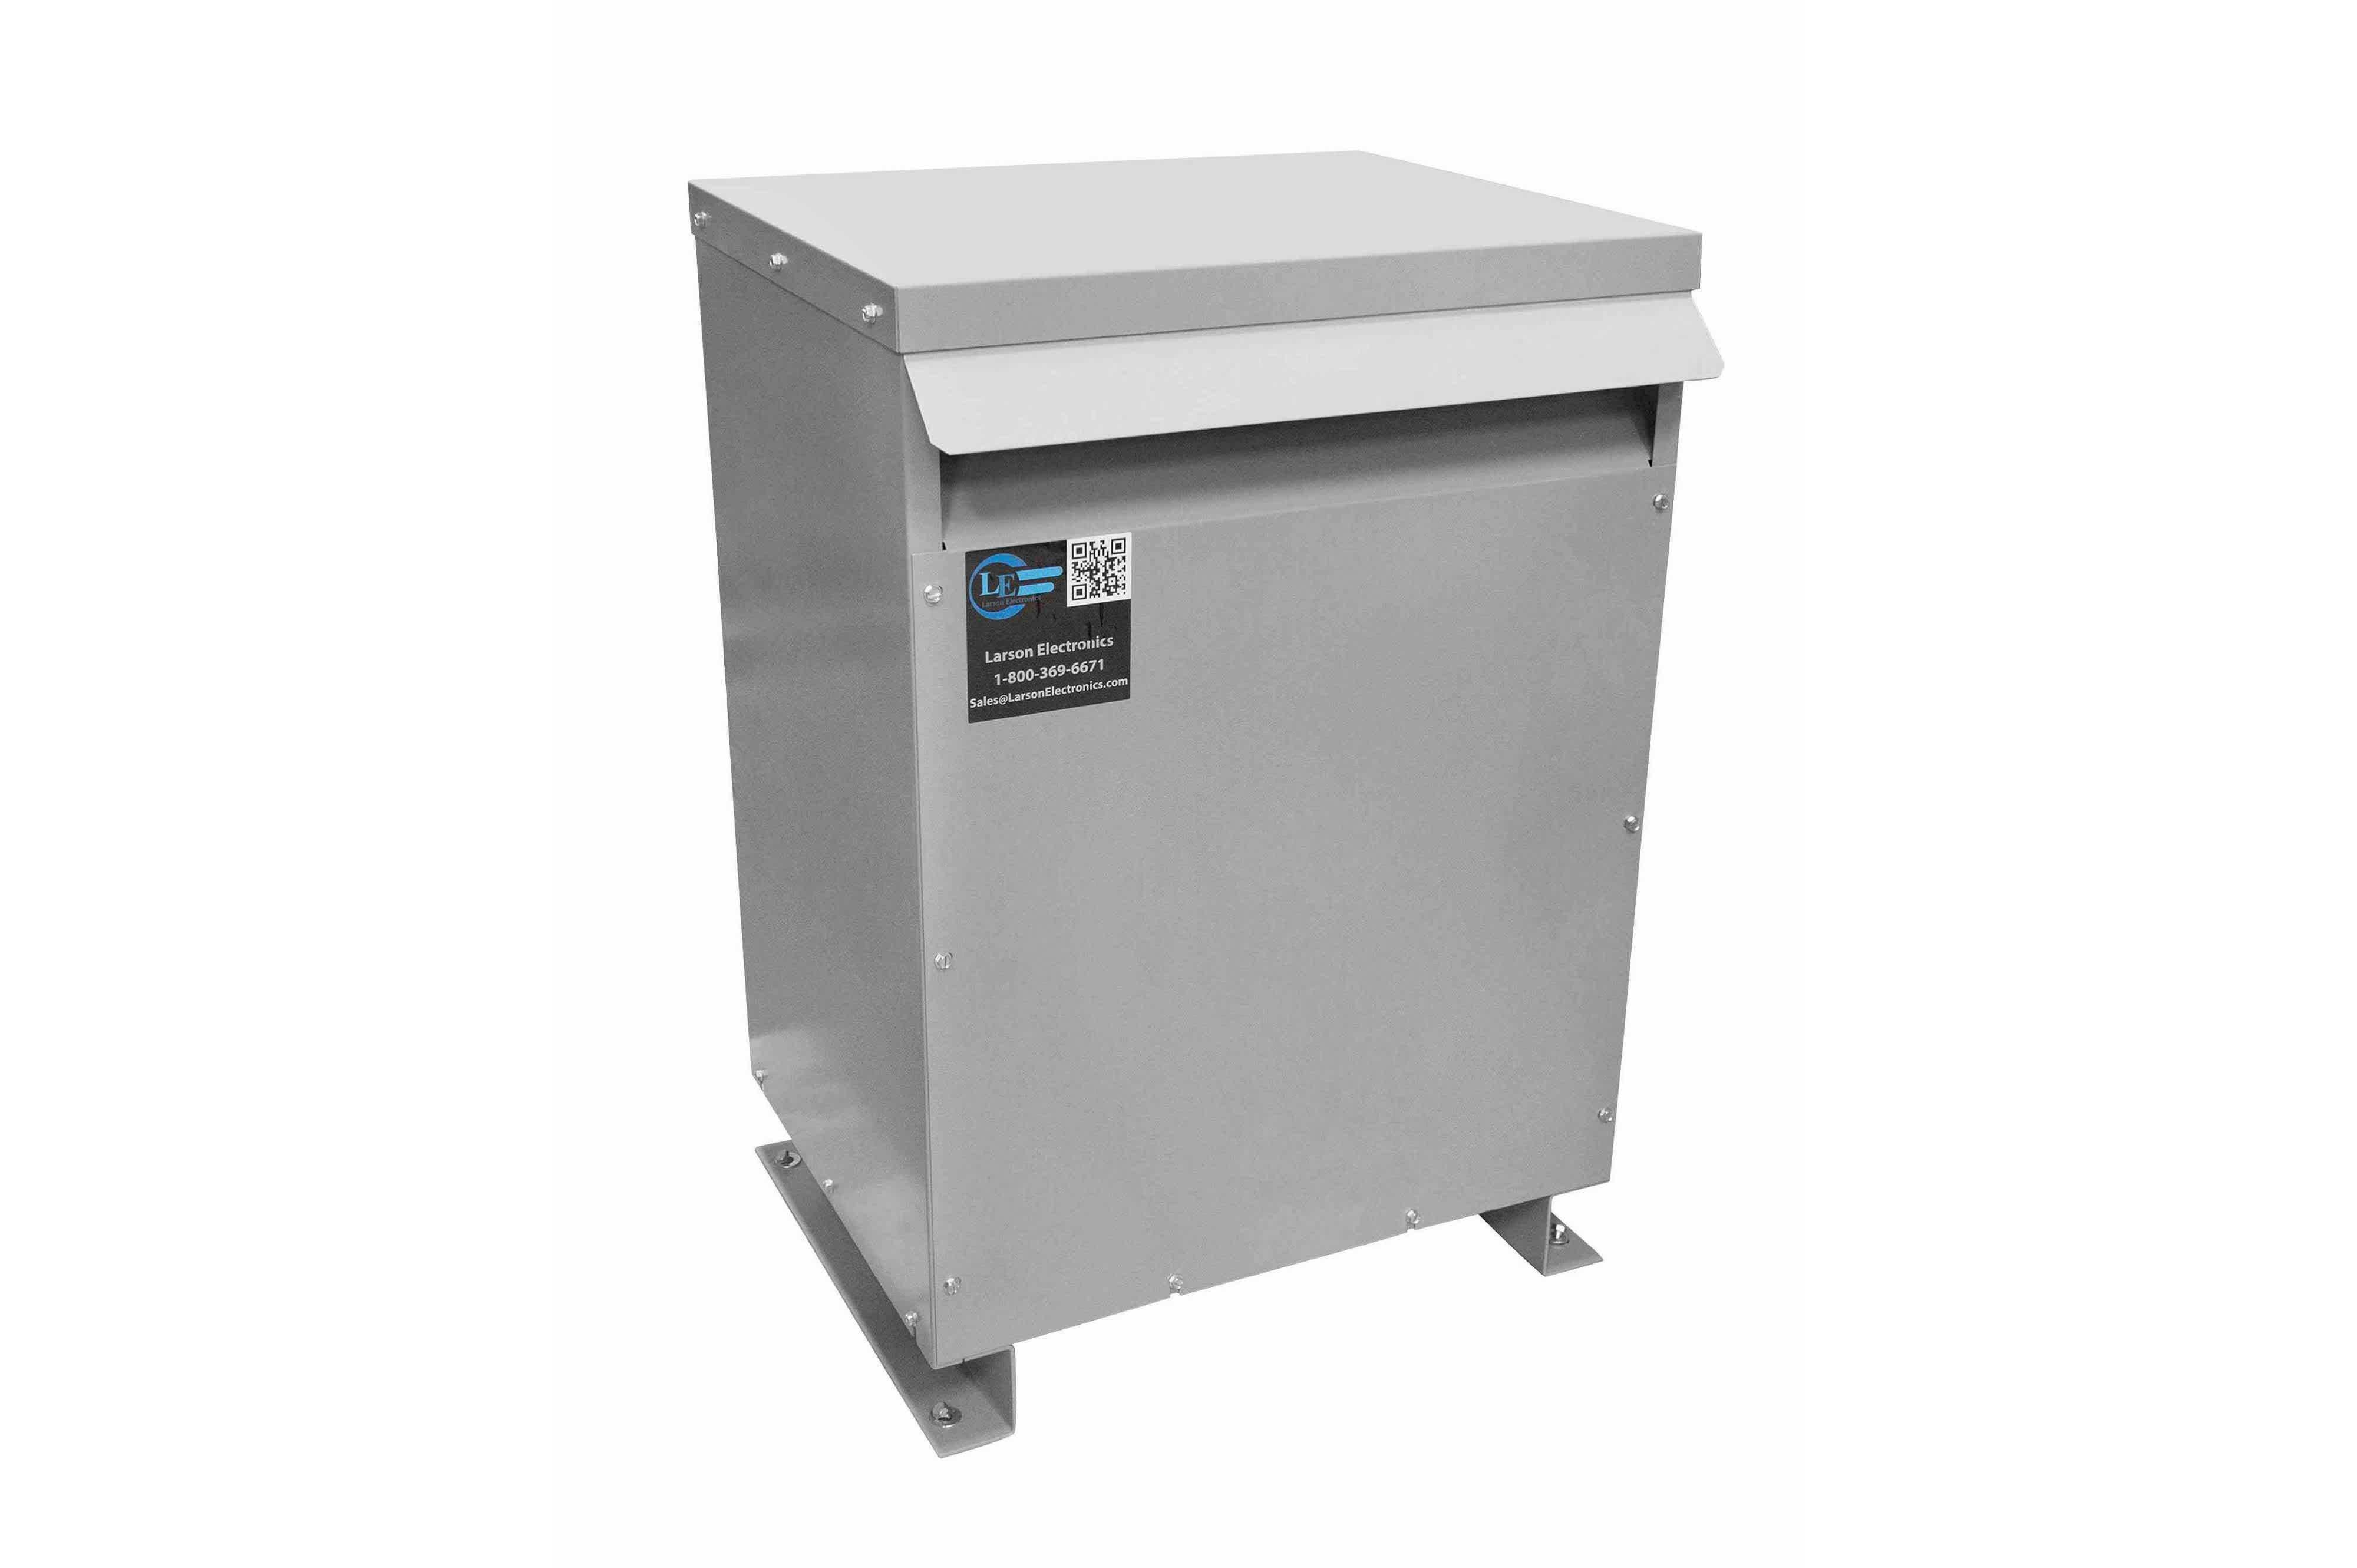 80 kVA 3PH Isolation Transformer, 208V Wye Primary, 415Y/240 Wye-N Secondary, N3R, Ventilated, 60 Hz